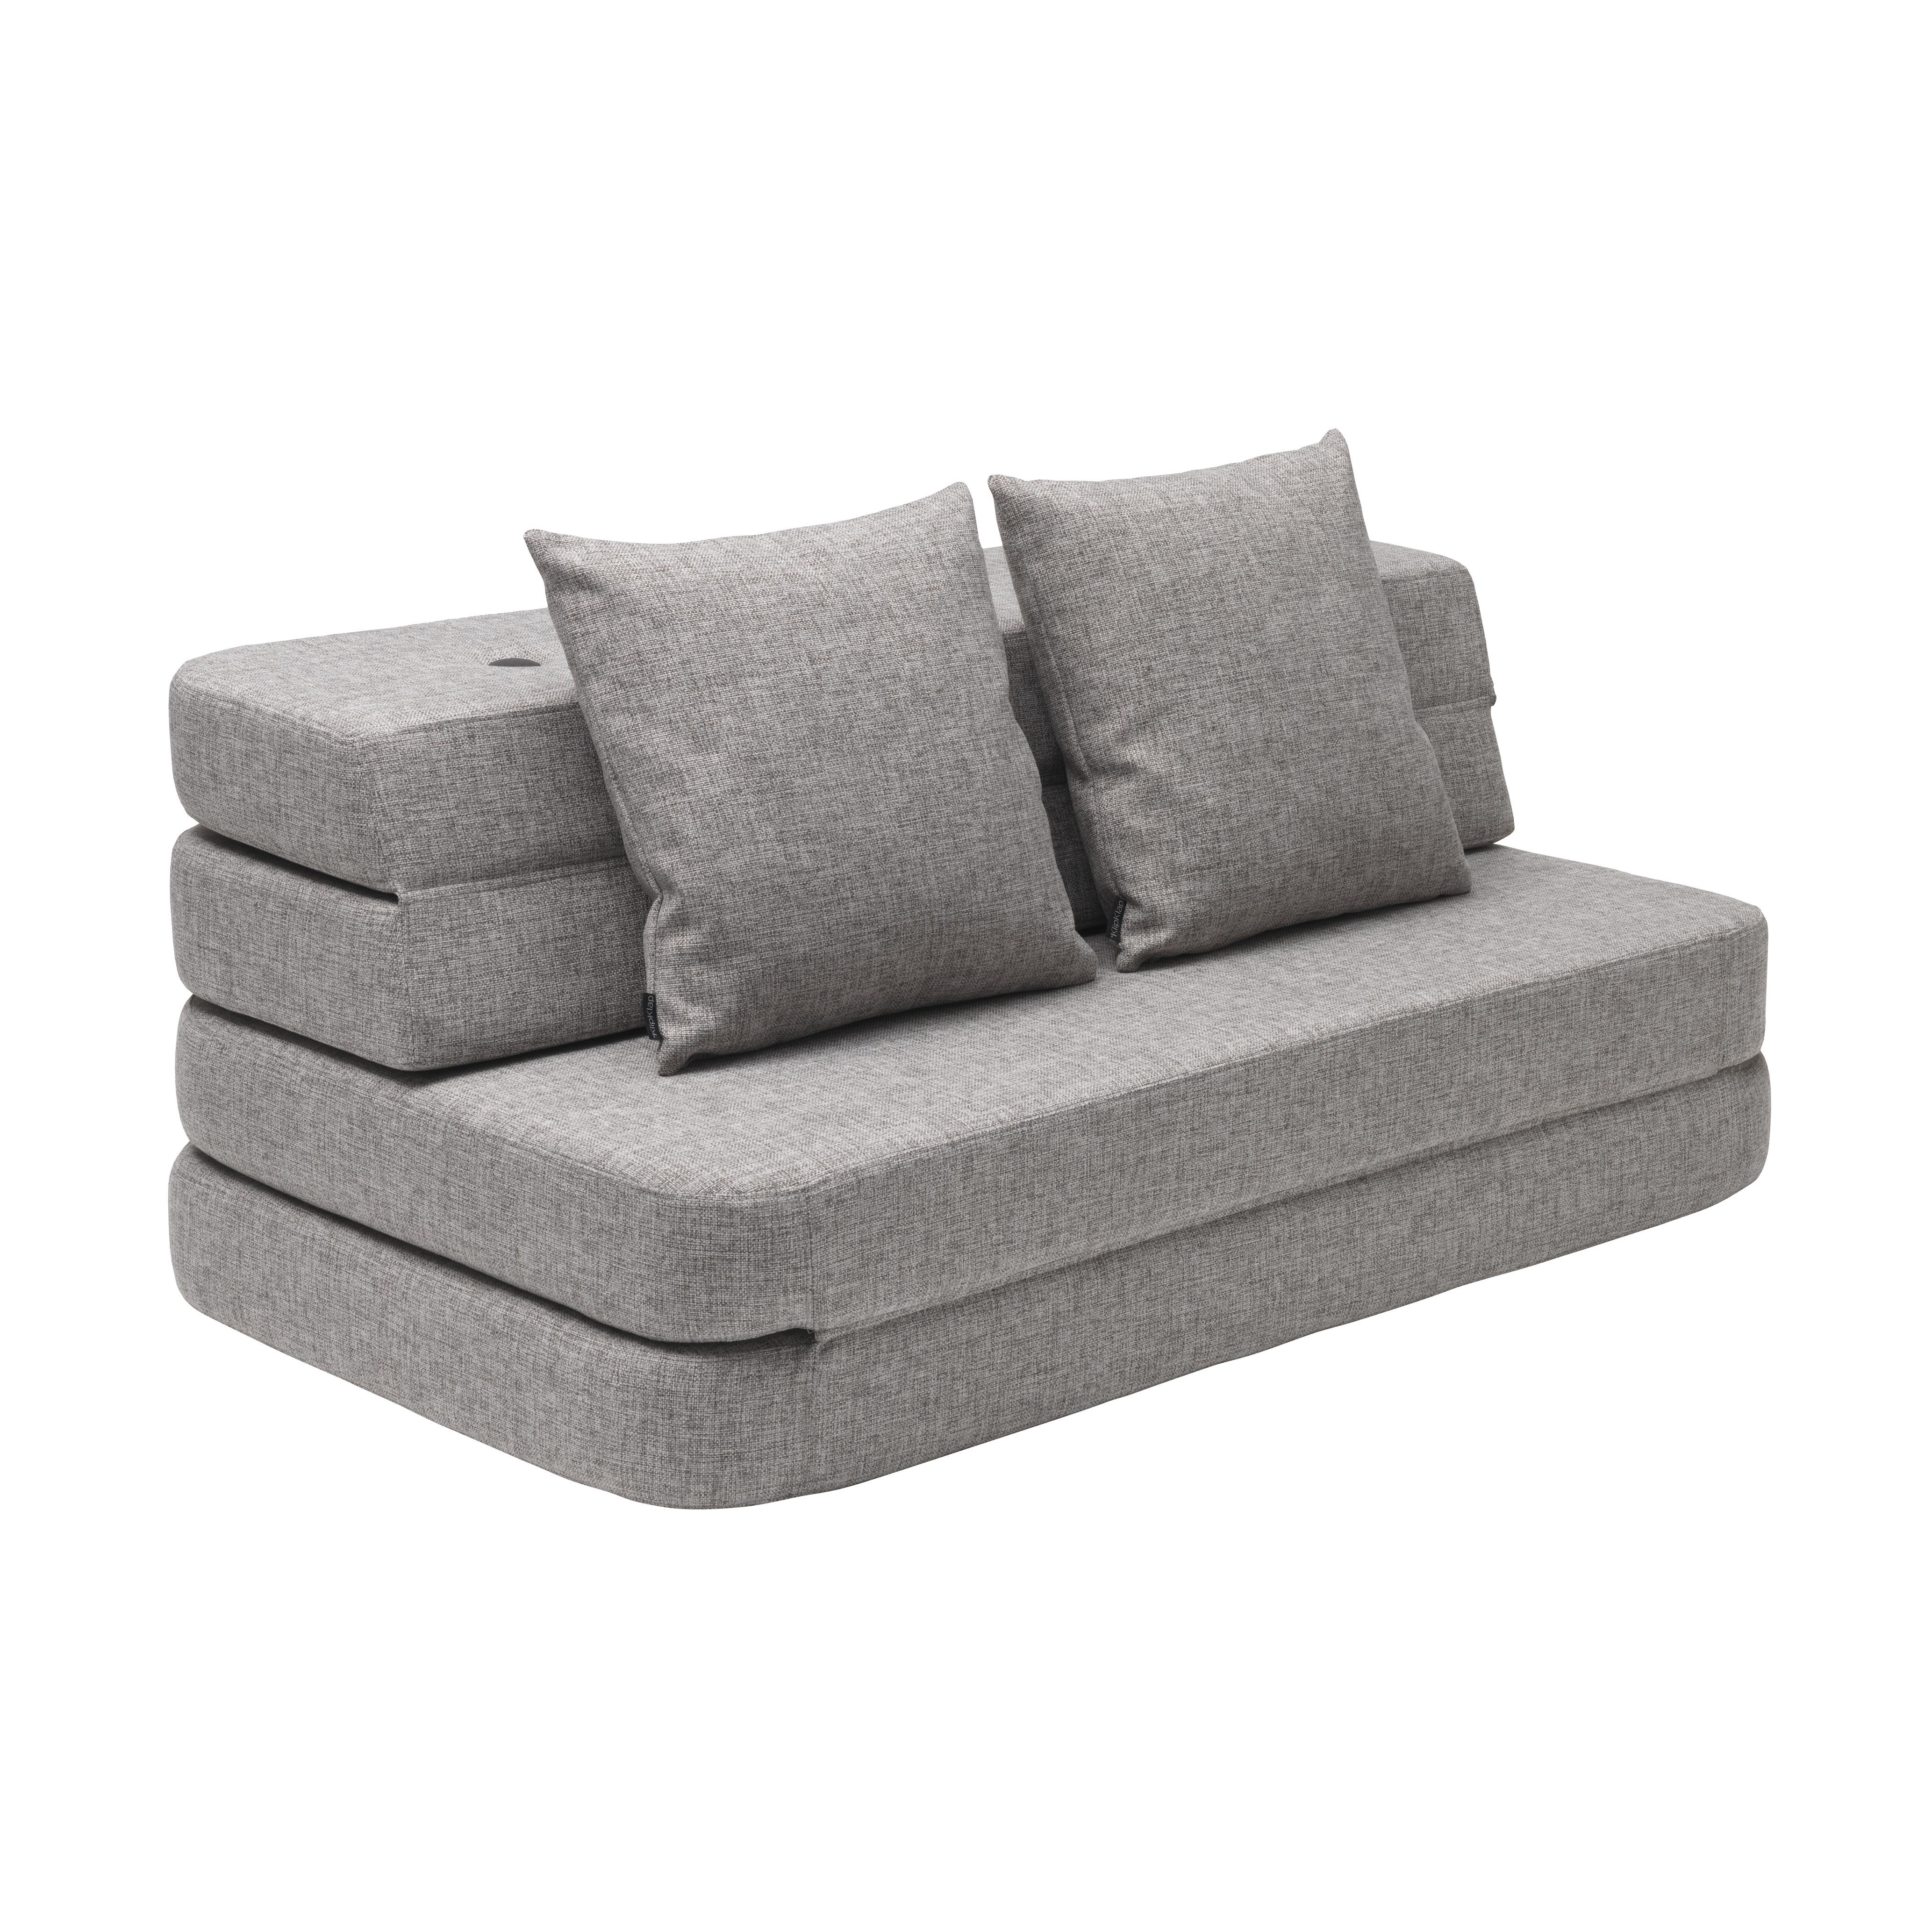 By Klipklap 3 Fold Xl Couch Multi Grey